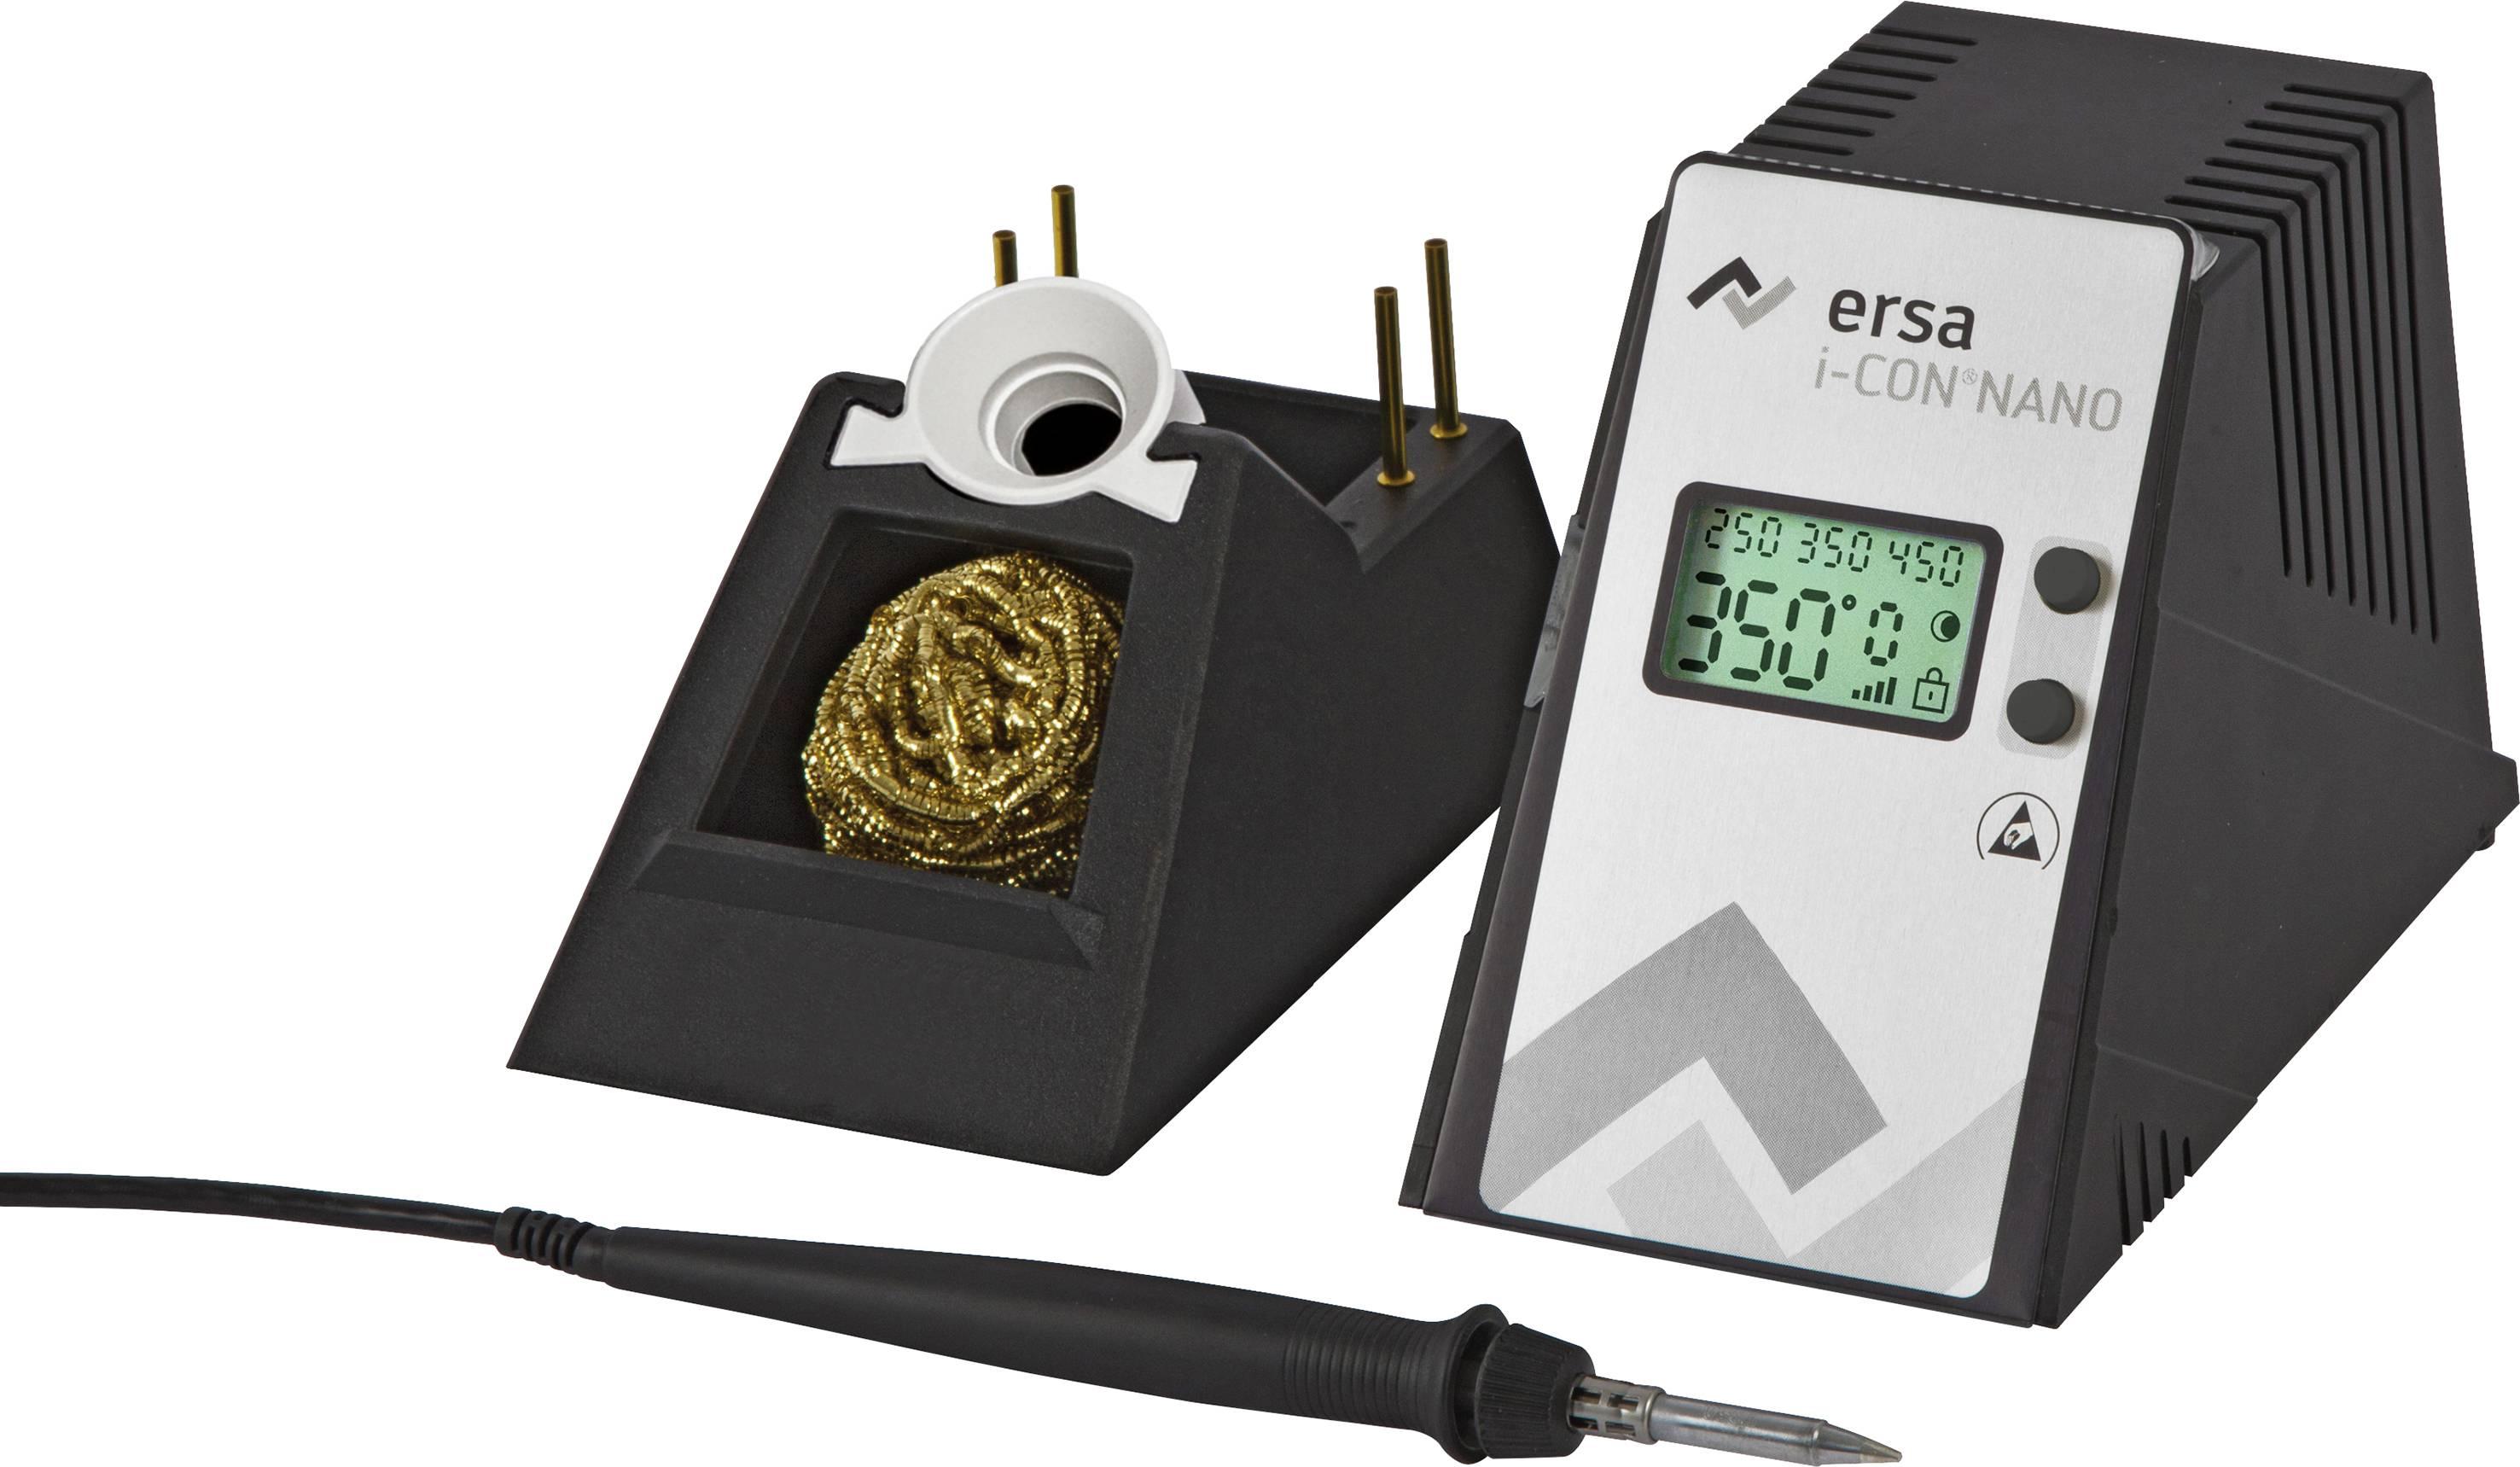 Spájkovacia stanica ERSA i-CON Nano